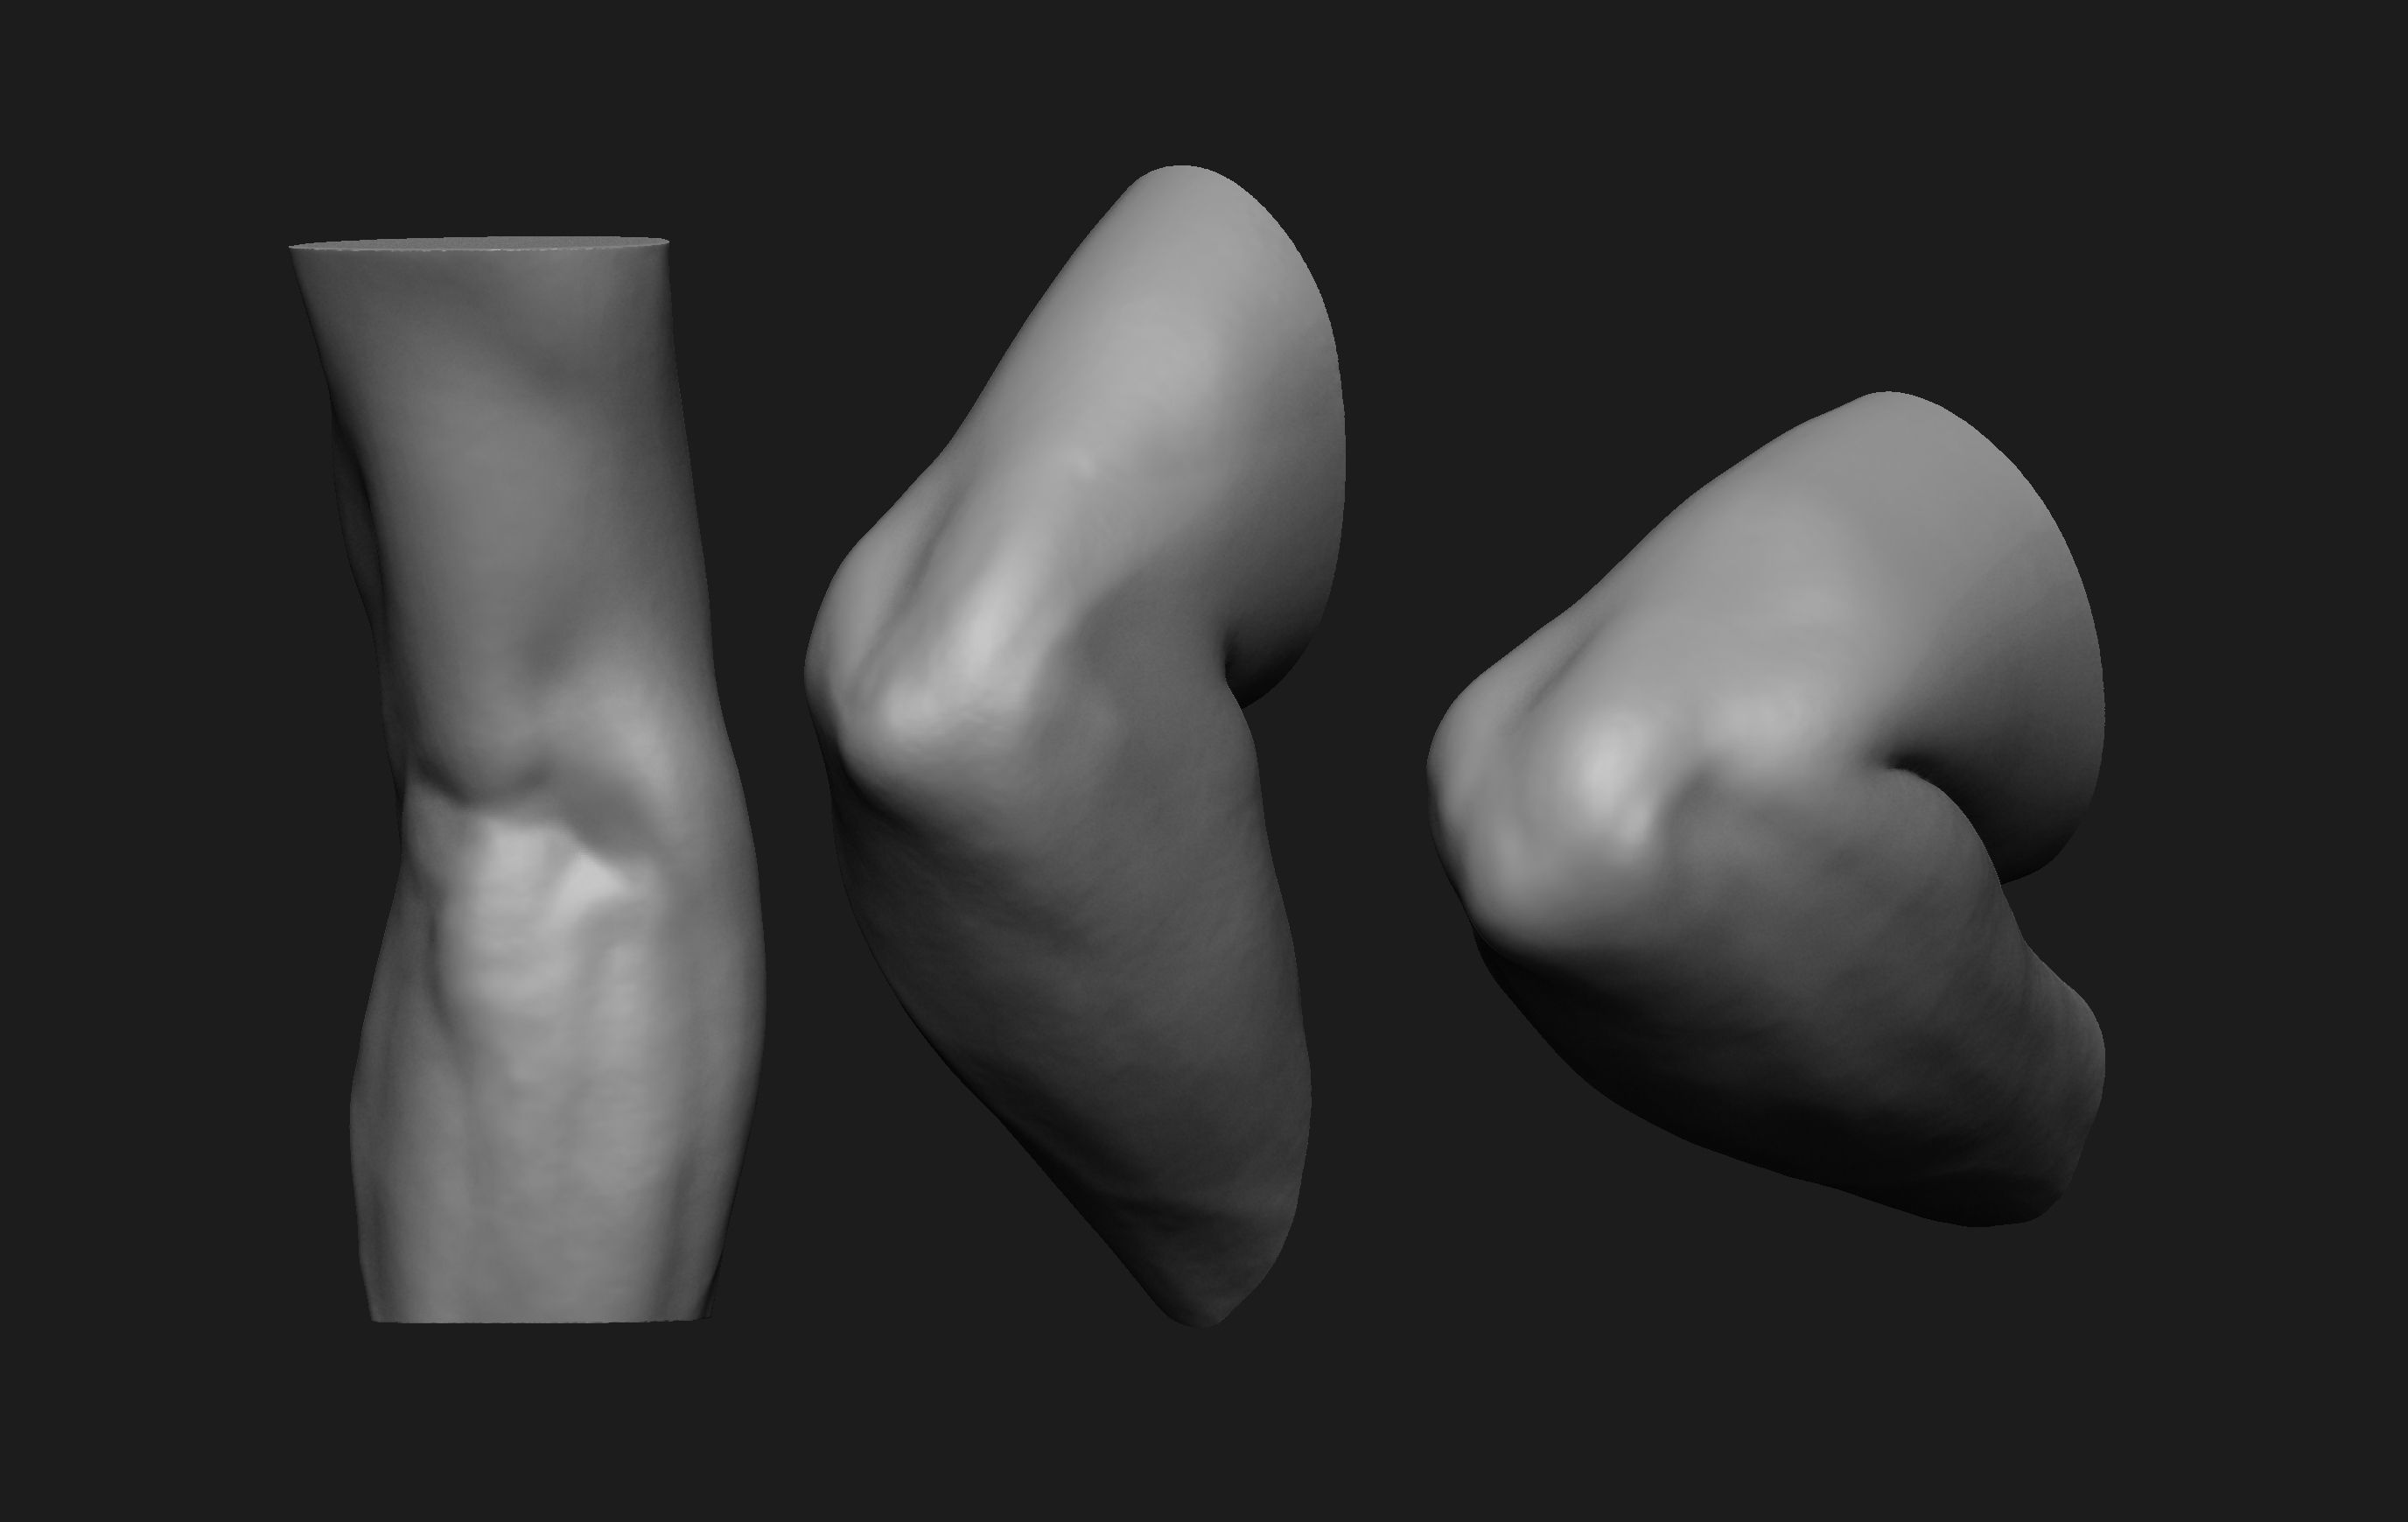 Elbow Set Anatomy Reference